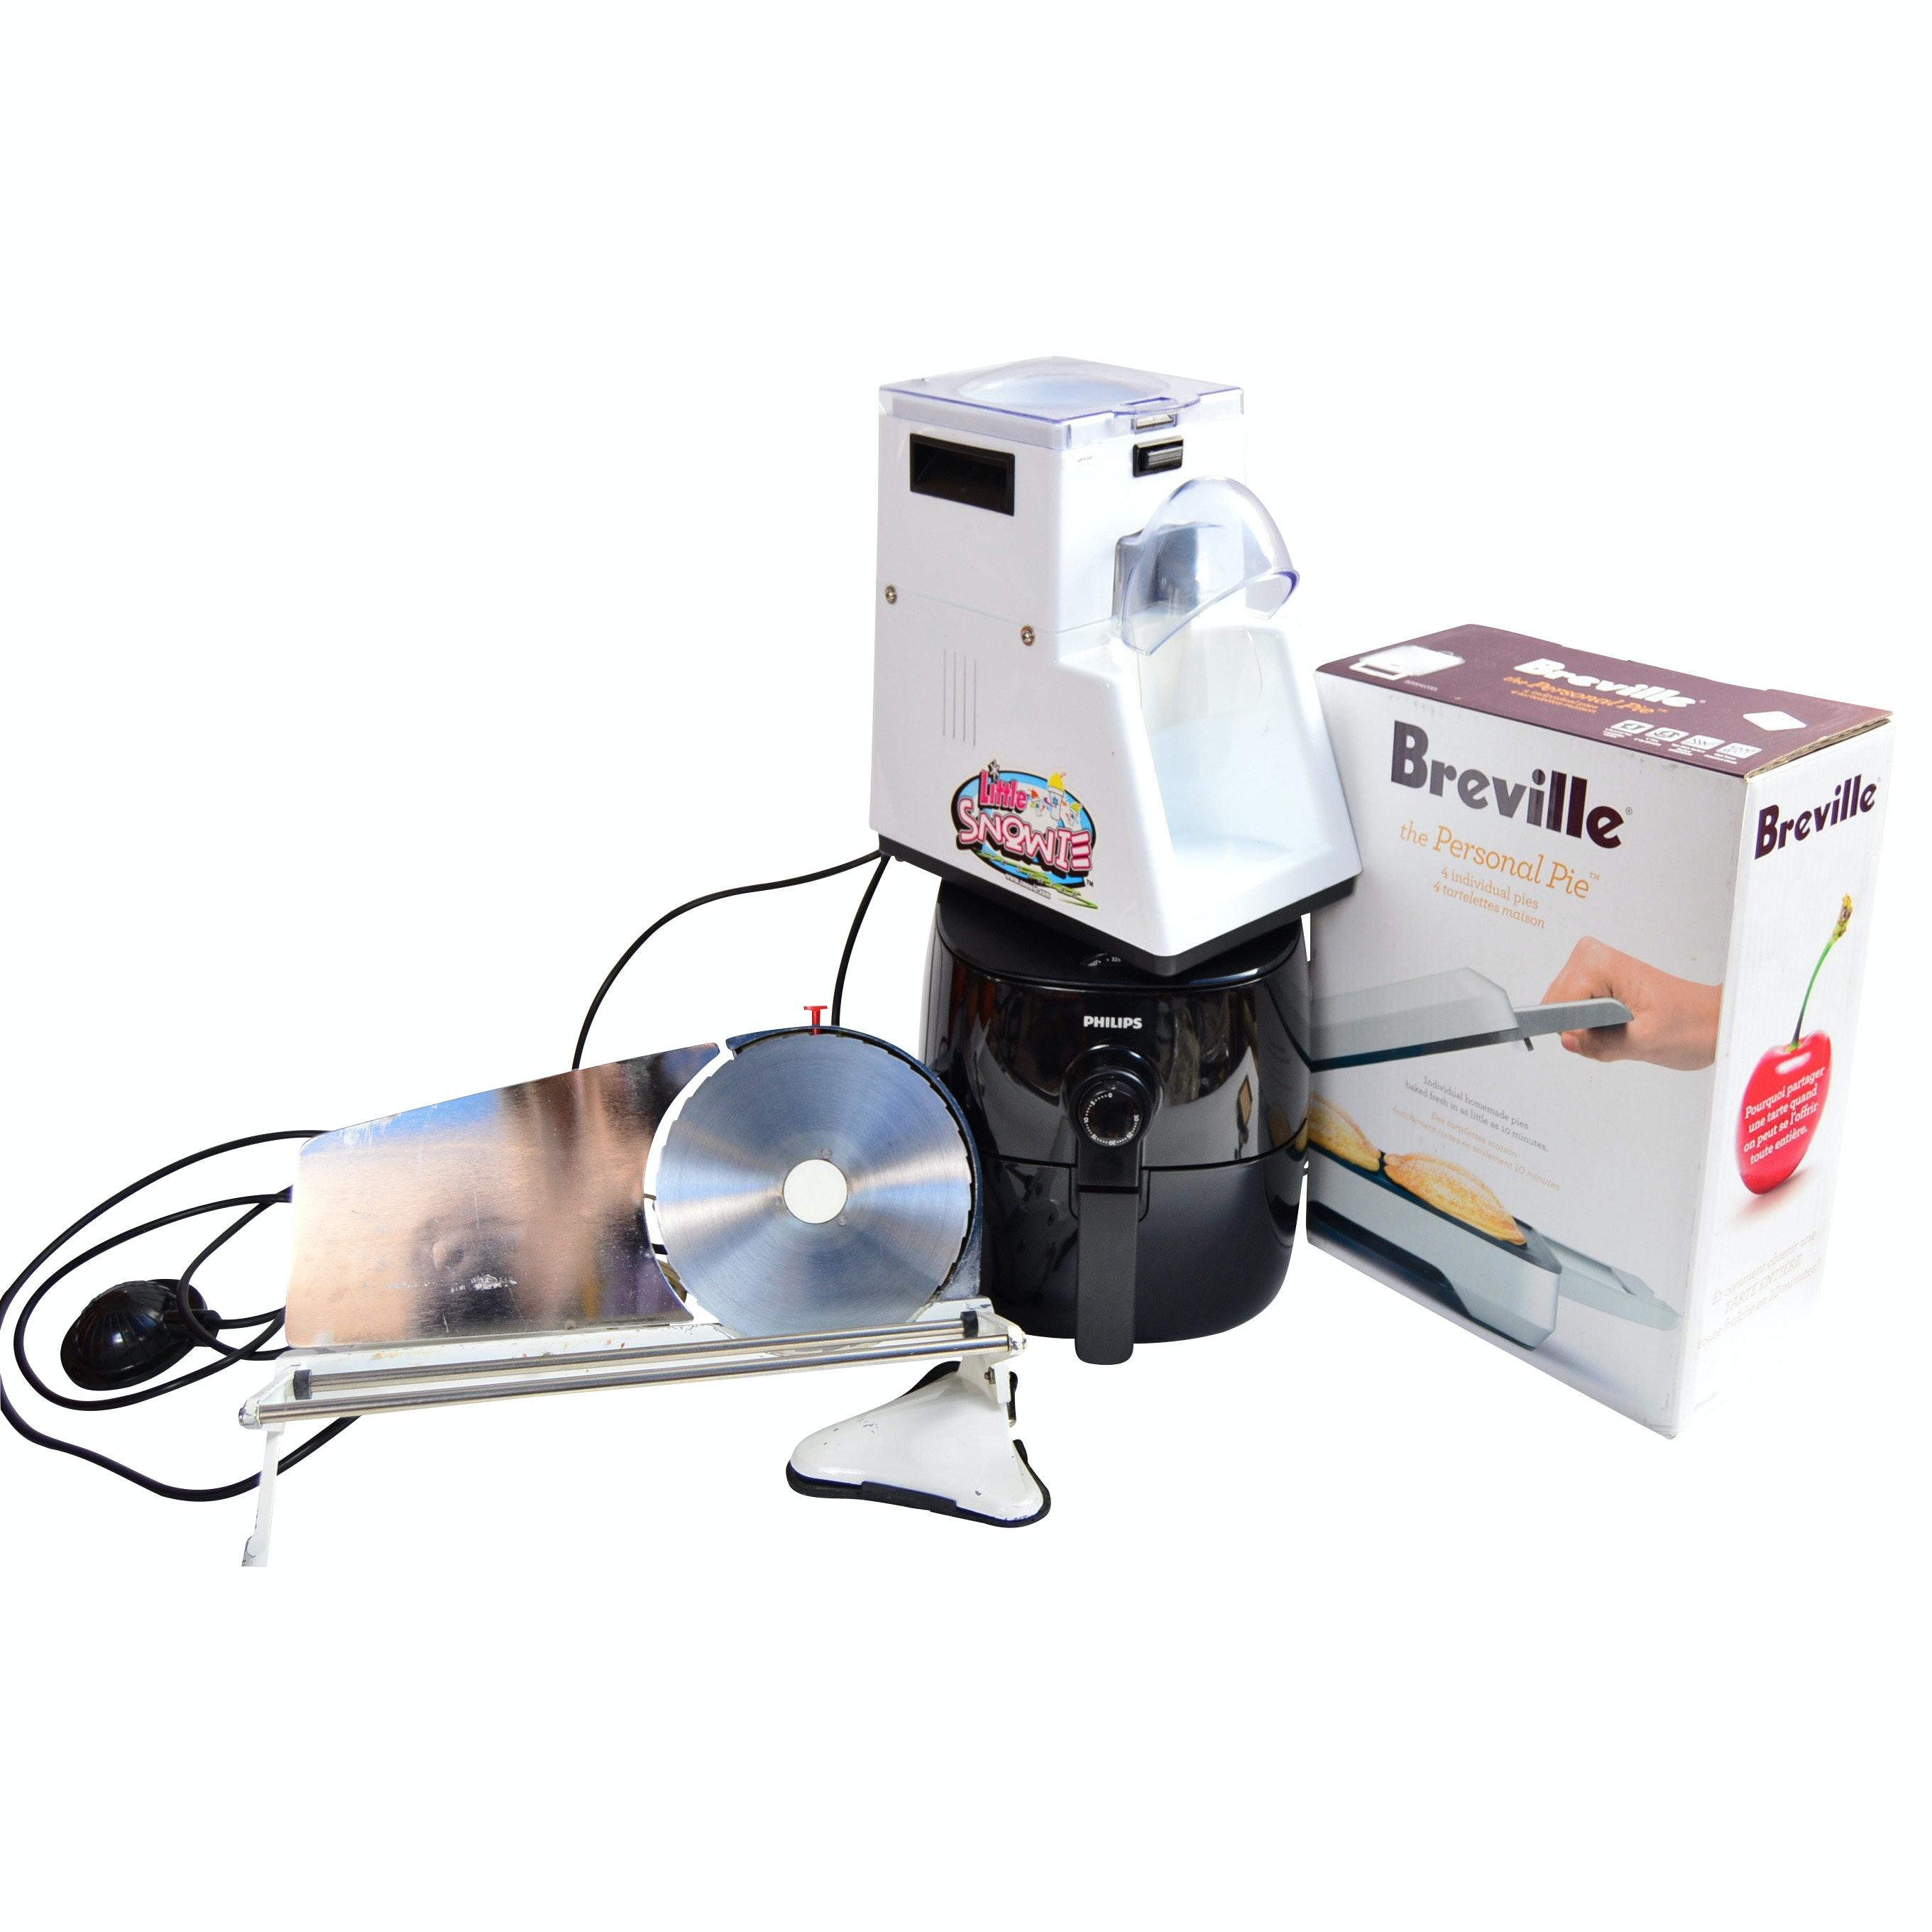 Appliances with Slicer, SnoCone Machine, Breville Pie Maker, Philips Air Fryer